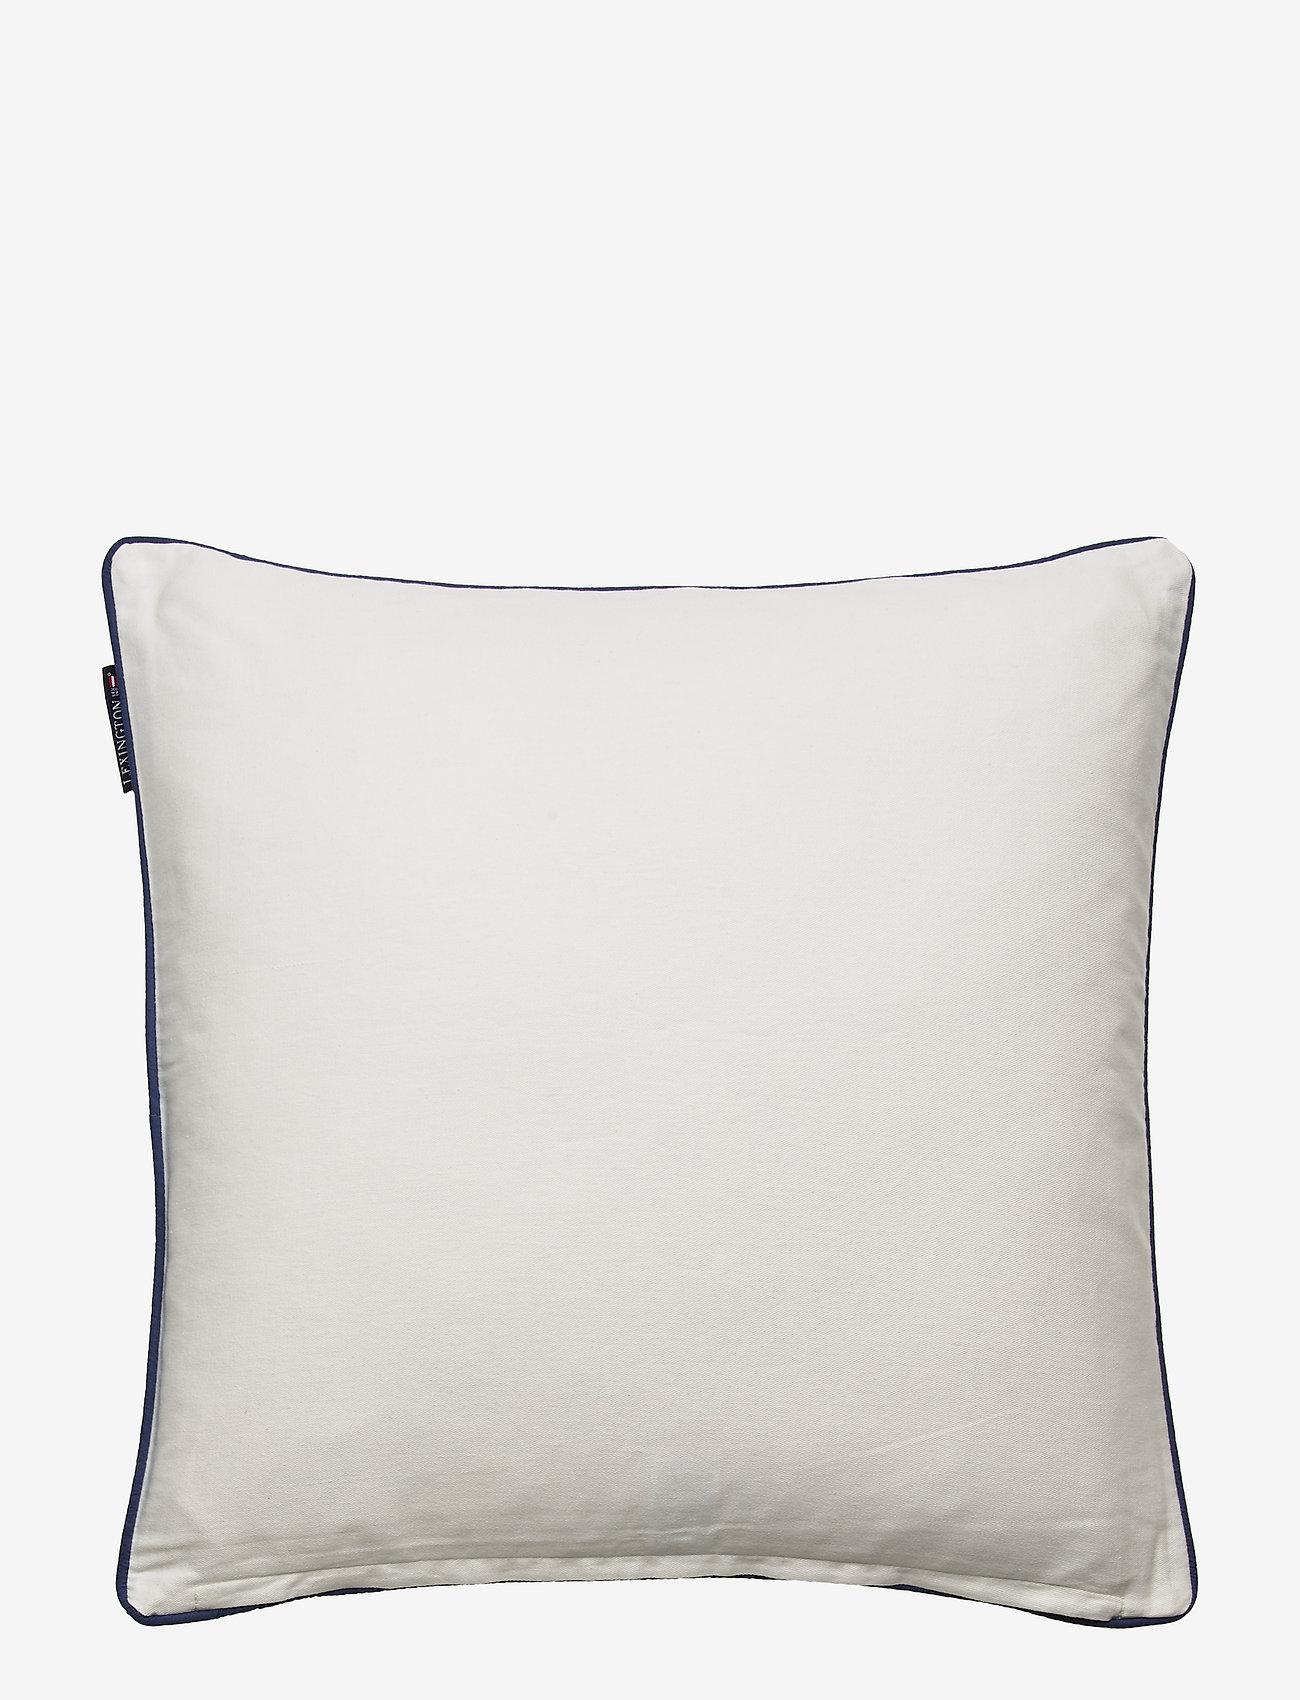 Gone To The Beach Cotton Pillow Cover (White) (69 €) - Lexington Home 7niX69kZ